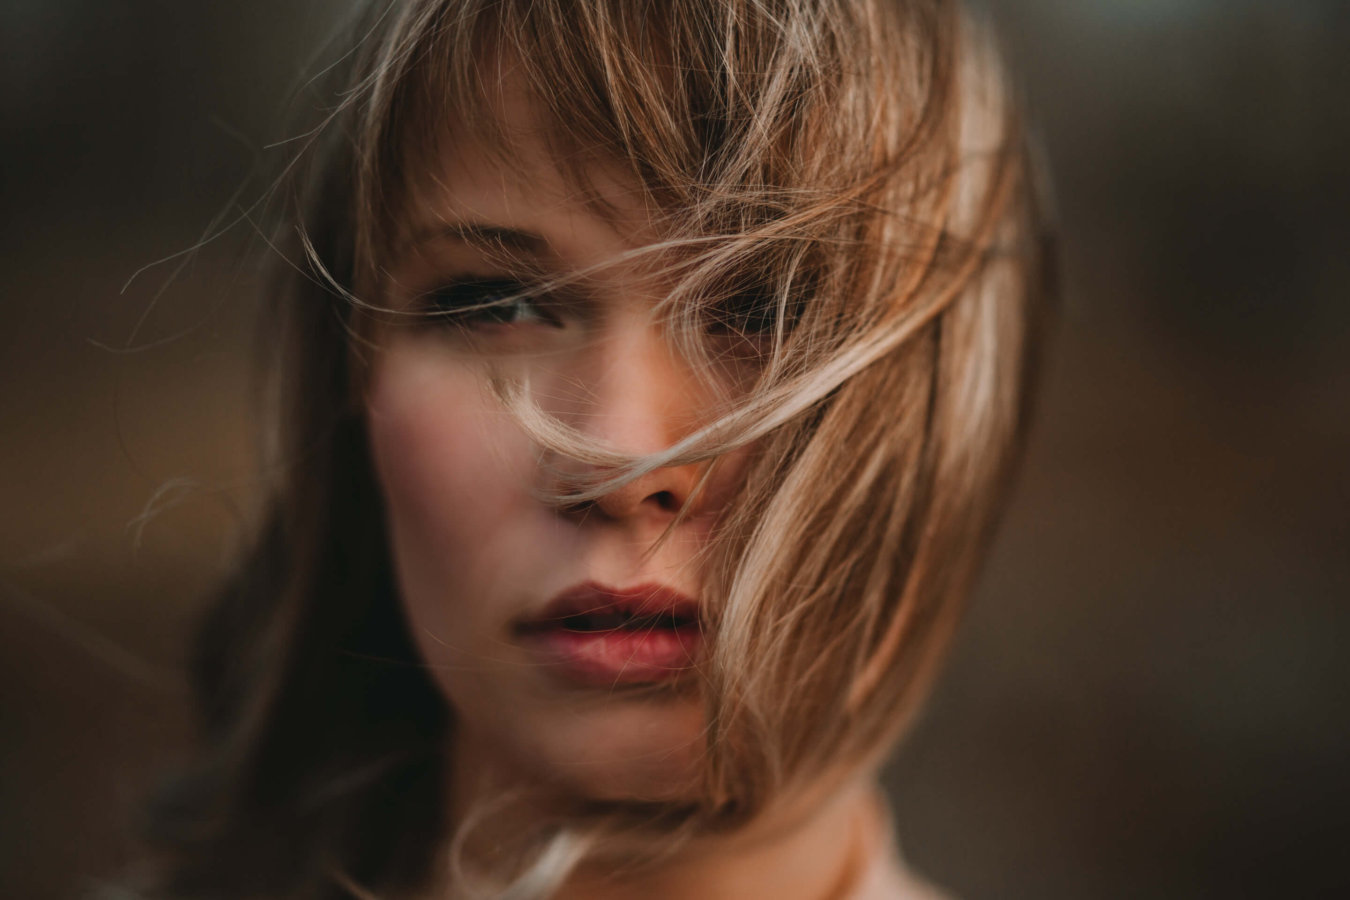 Calgary Portrait Model | Closeup | Alberta Modelling Photographer